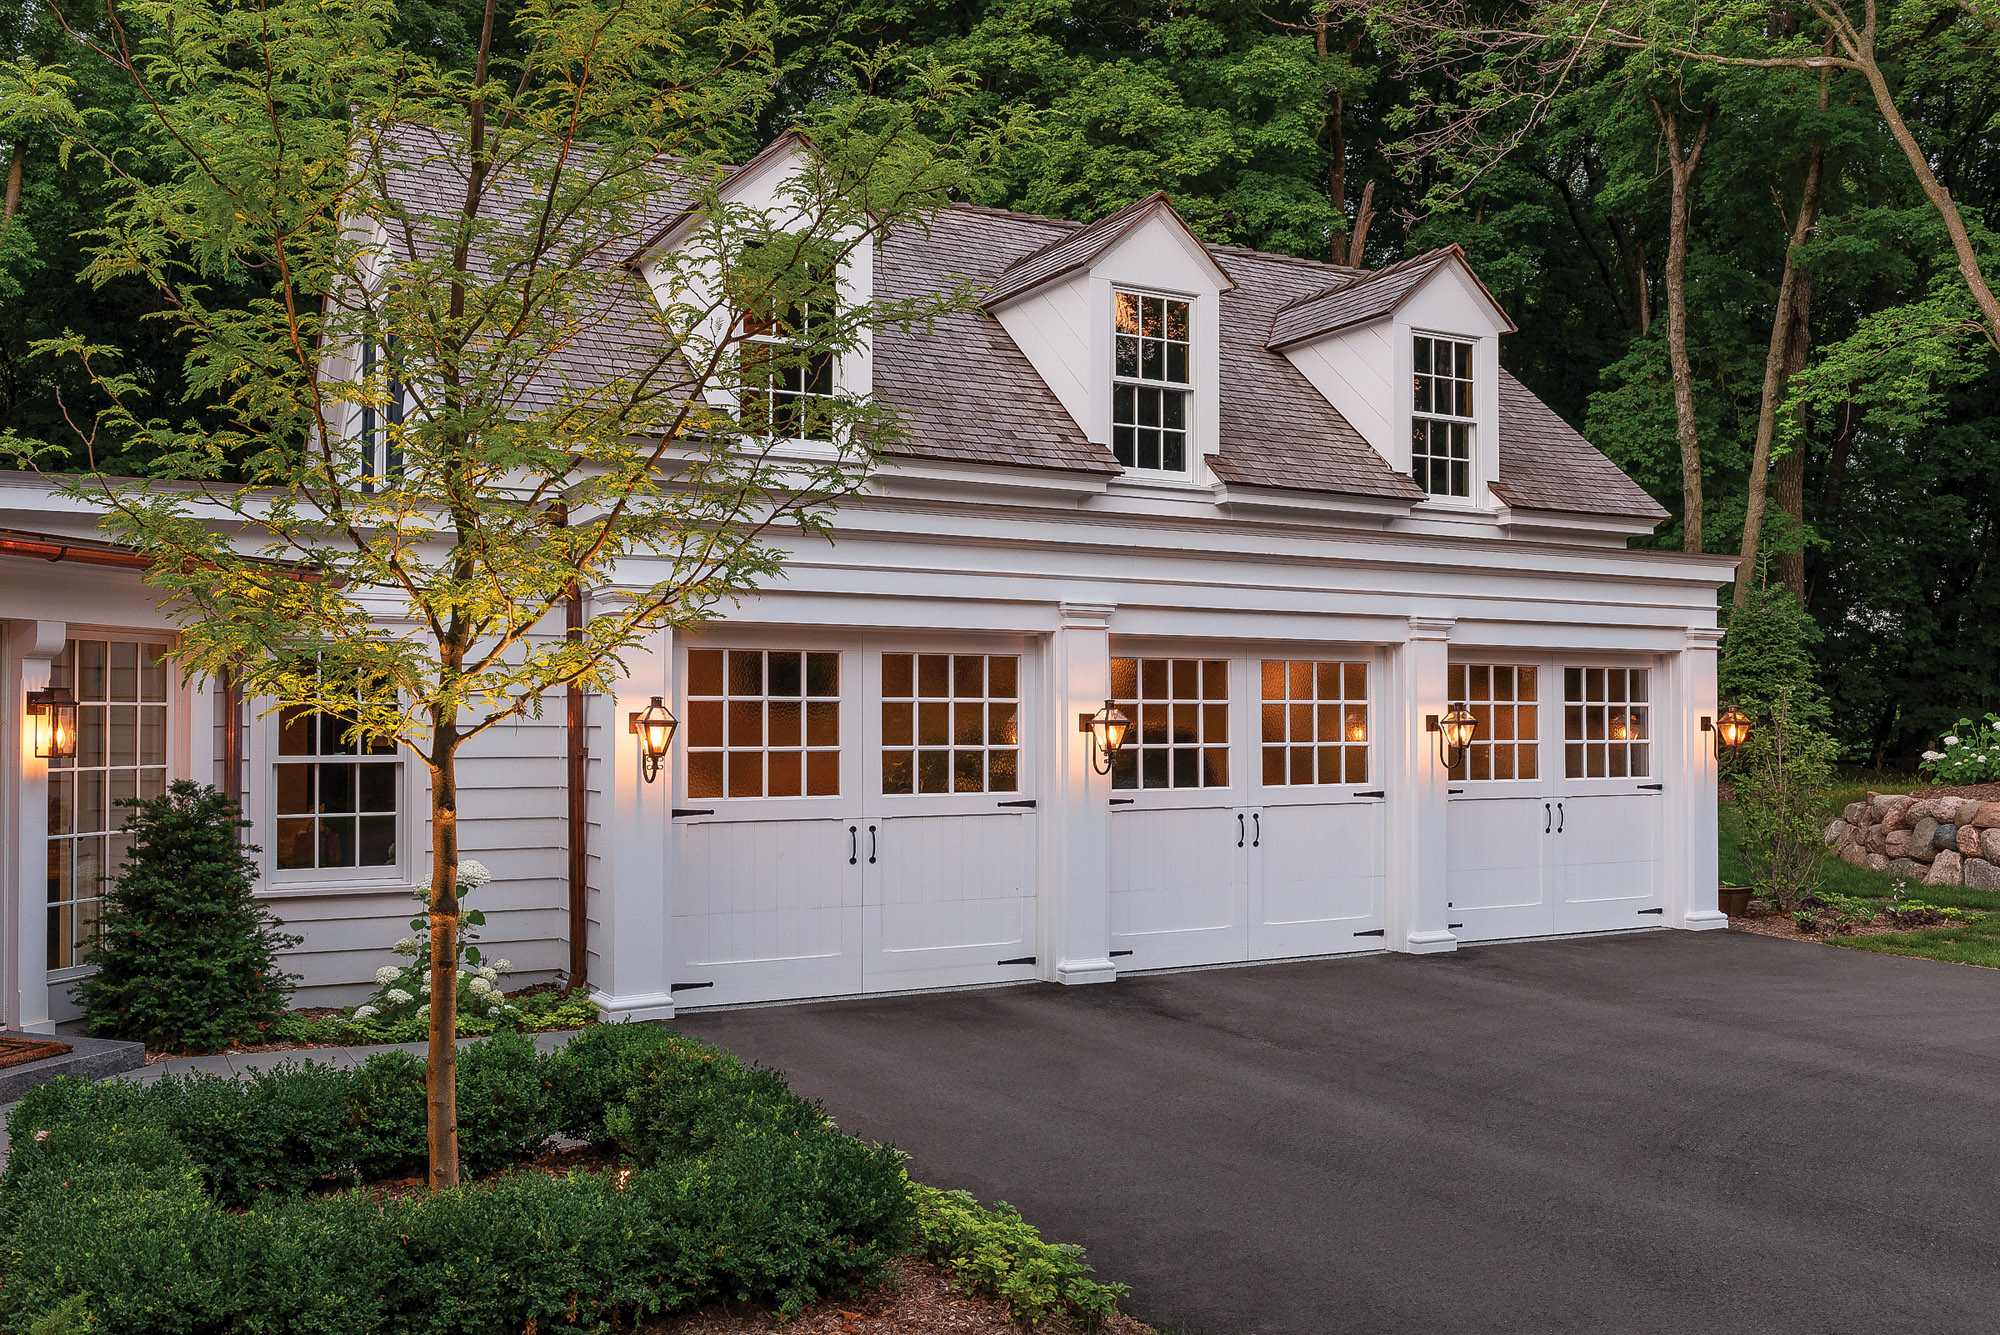 Garage Doors for Period Homes